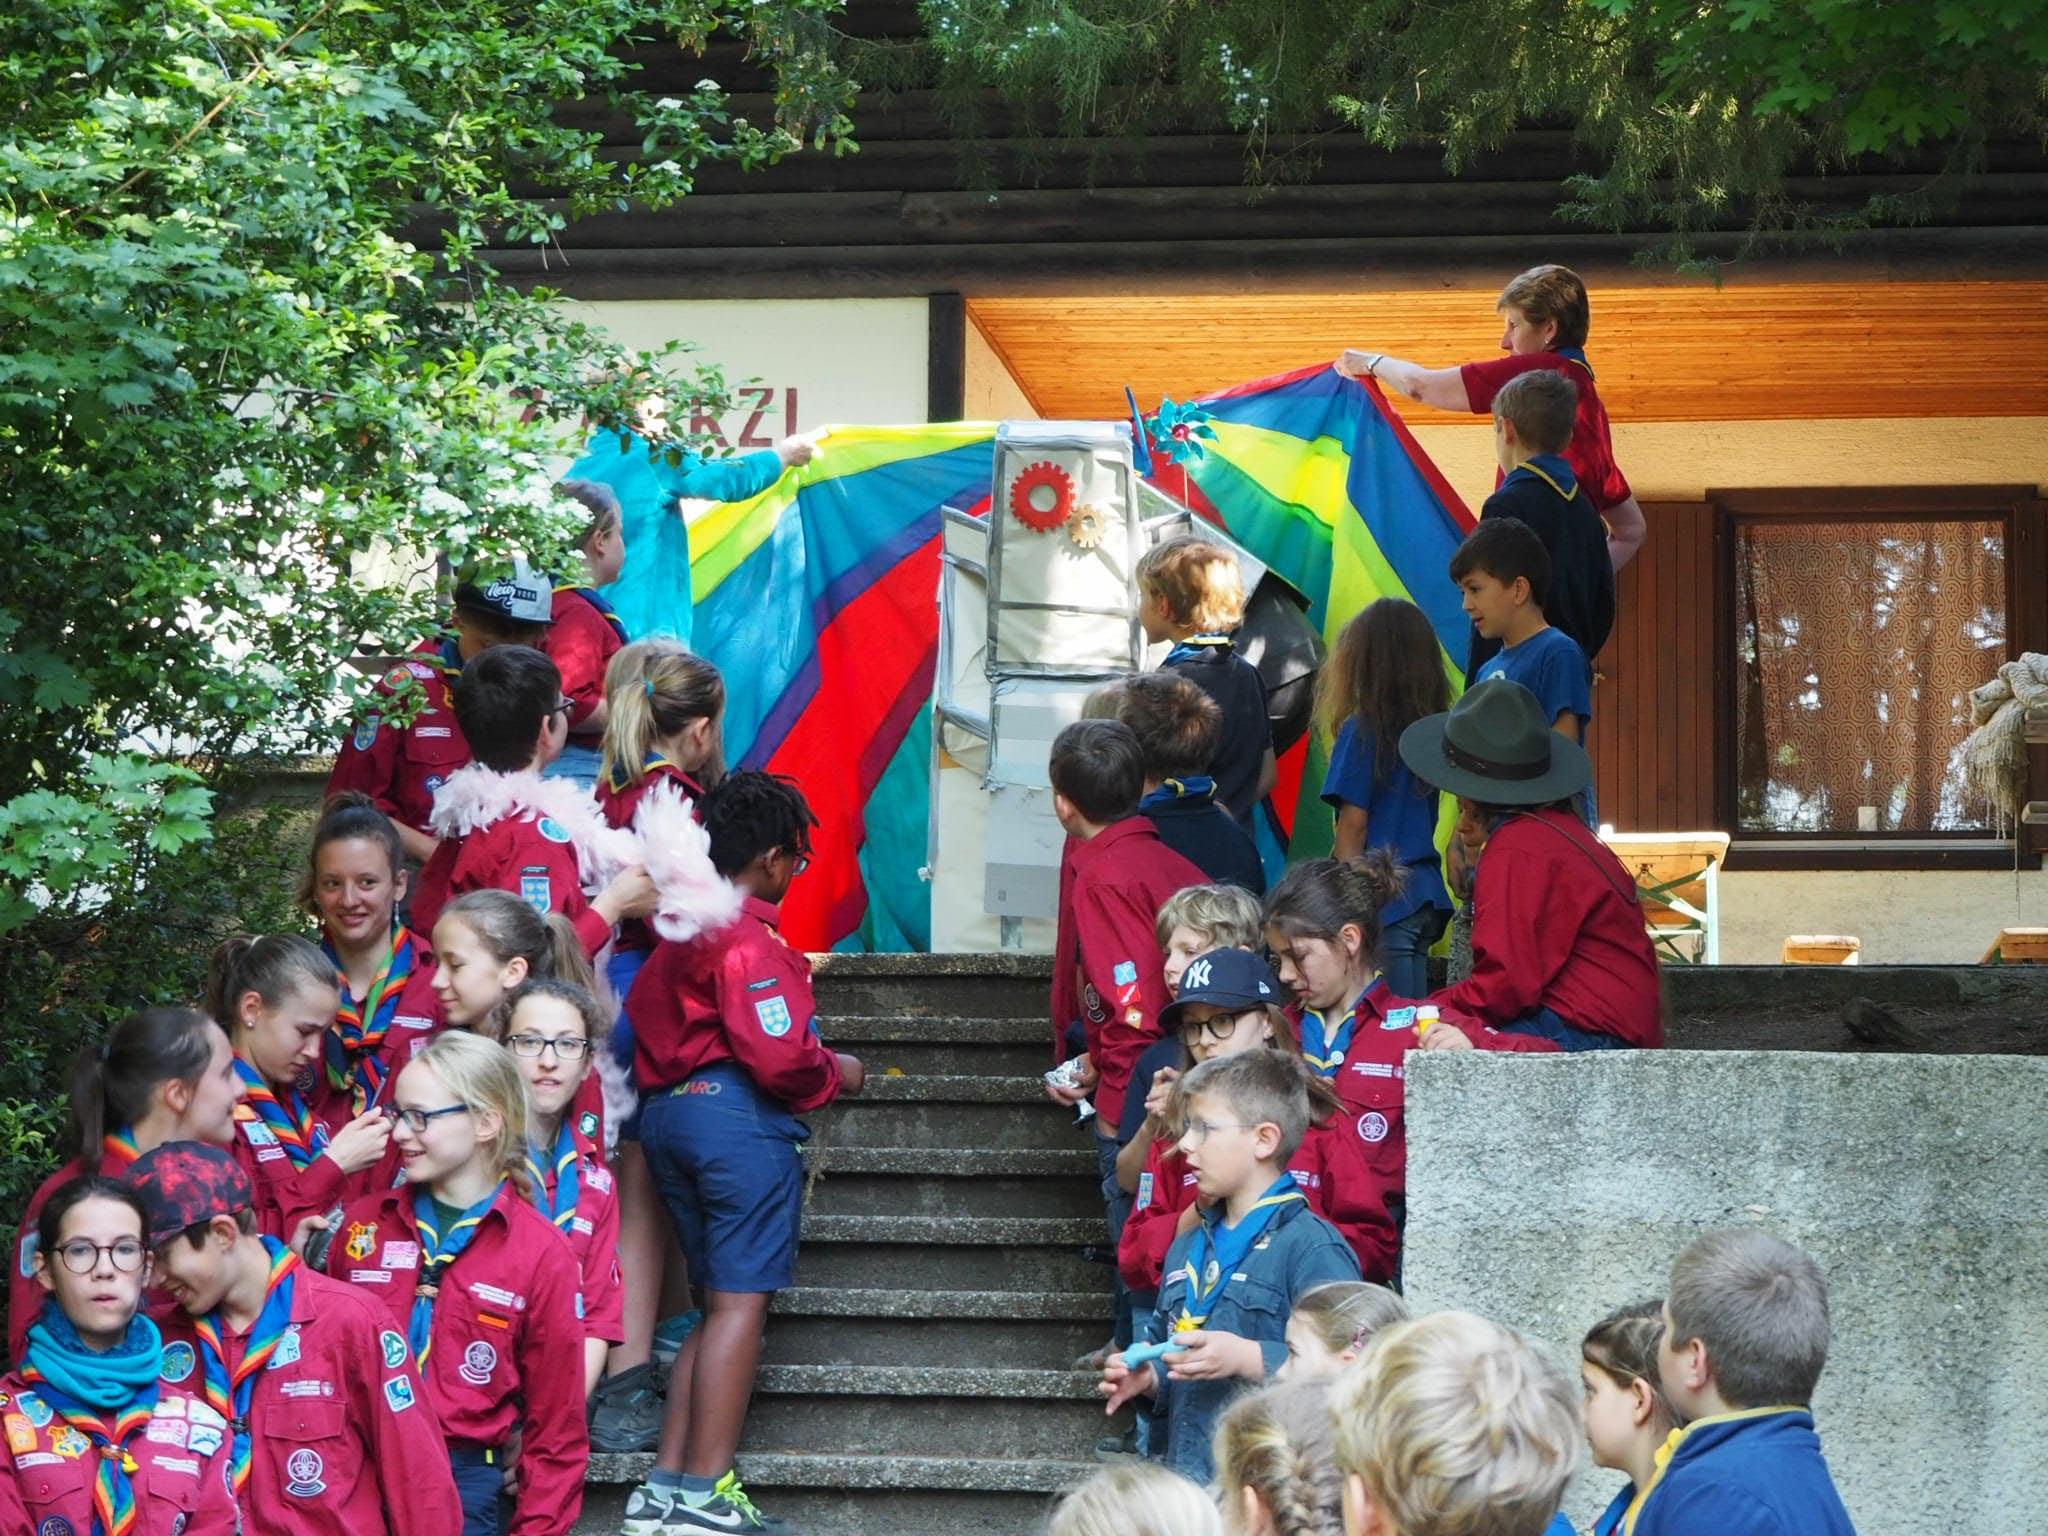 Event-Tipps - Was ist los in Klosterneuburg - rematesbancarios.com